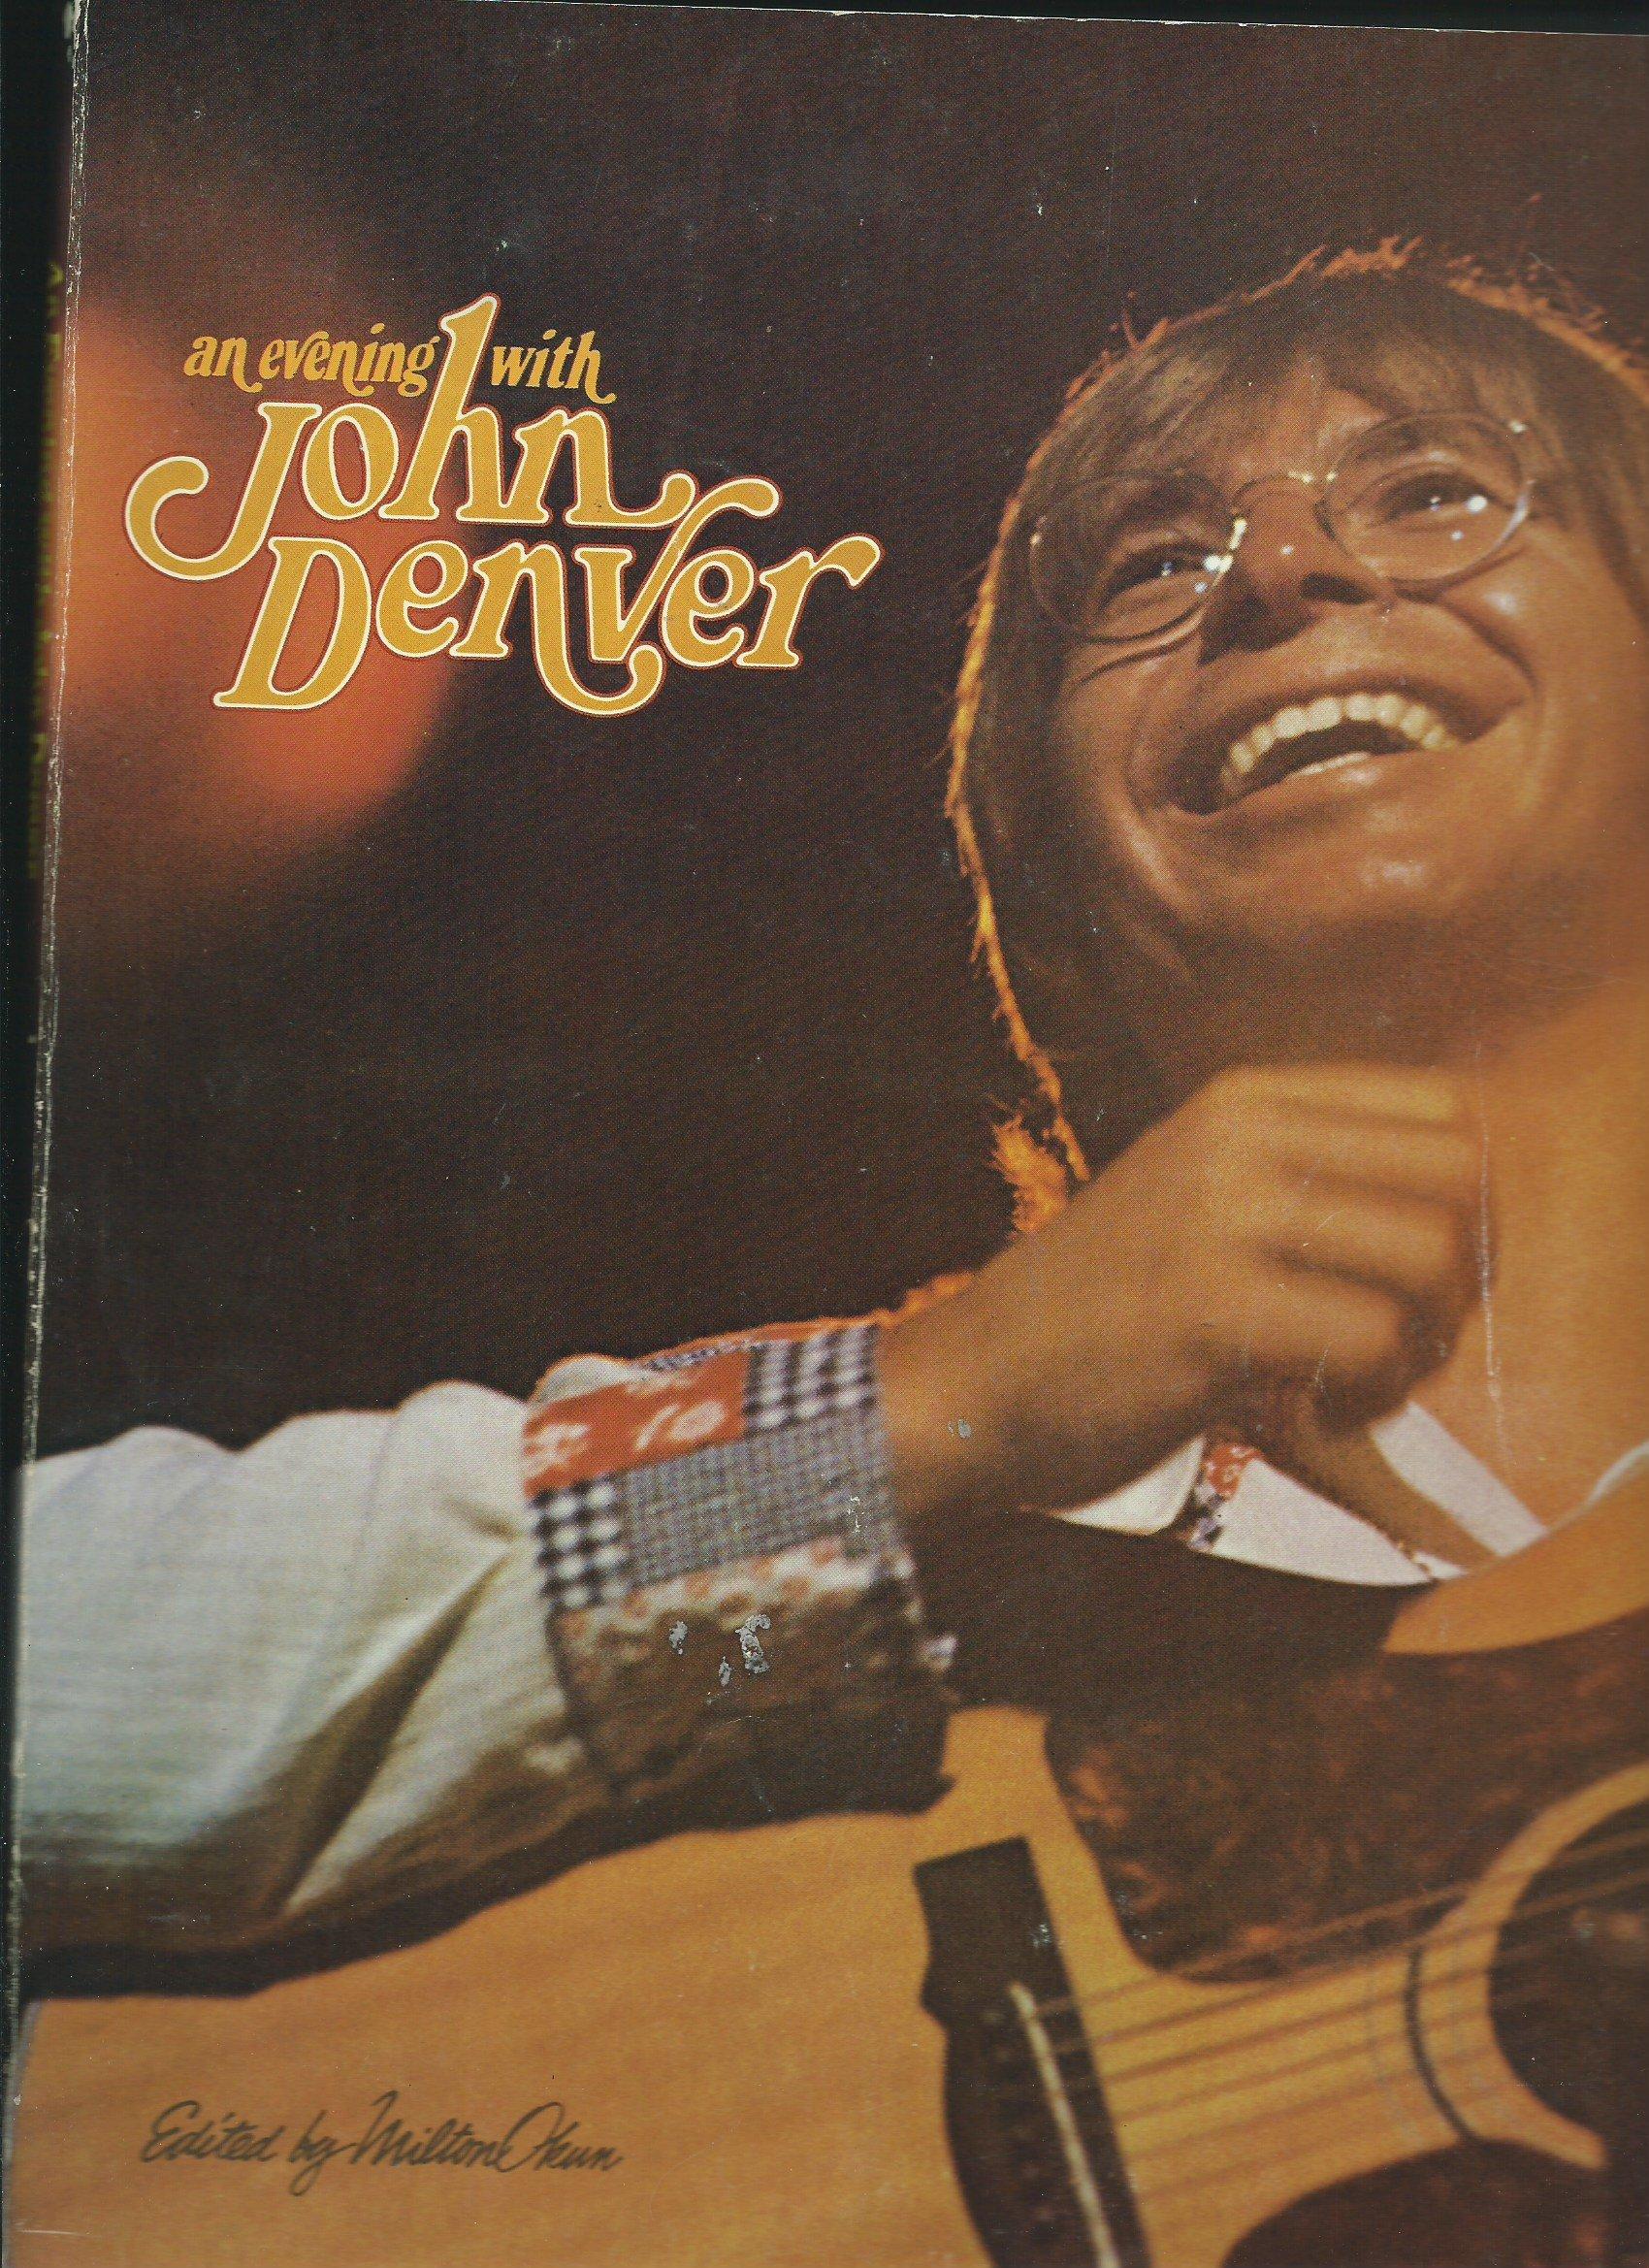 John denver grandma s feather bed sheet music - An Evening With John Denver John Edited By Milton Okun Denver Amazon Com Books